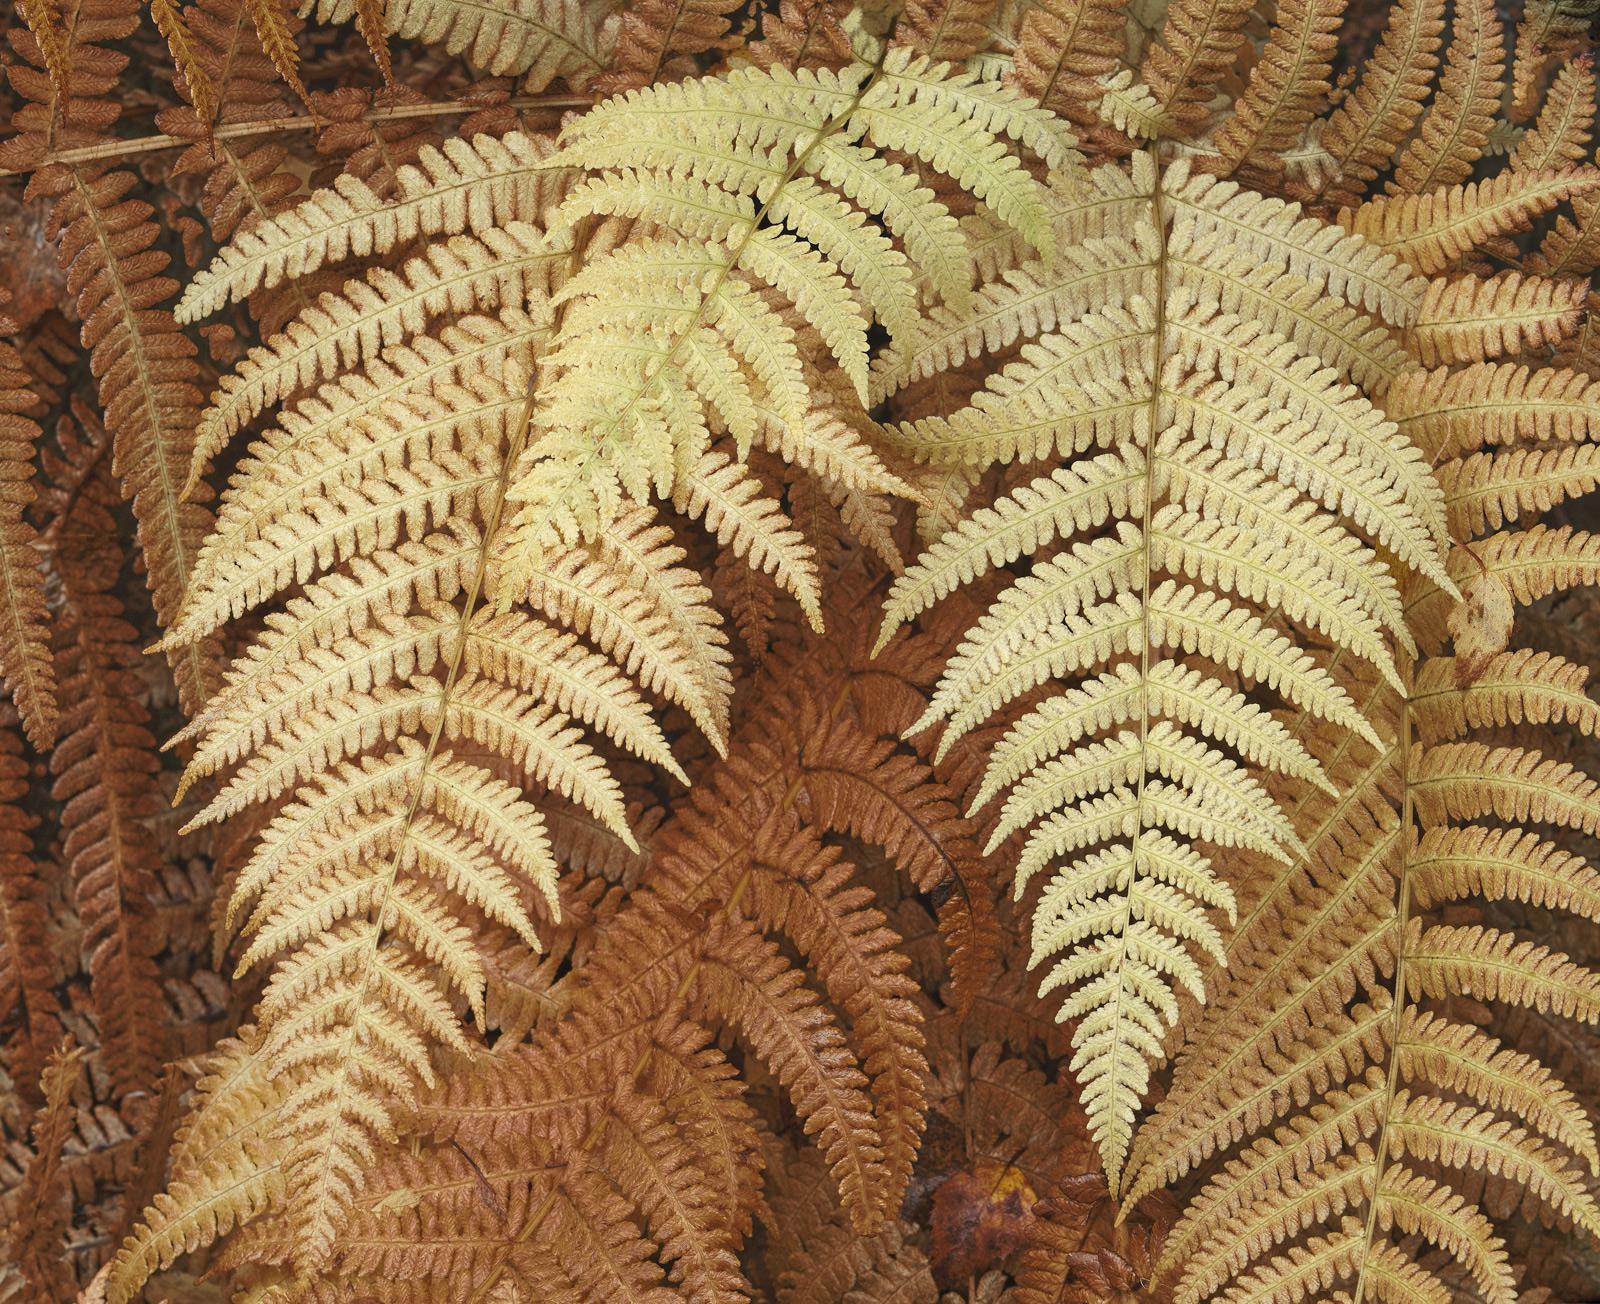 Glen Affric Ferns, Glen Affric, Highlands, Scotland ferns, stone, rockery, sheltered, wind, delicate, pale, loam, elegan, photo